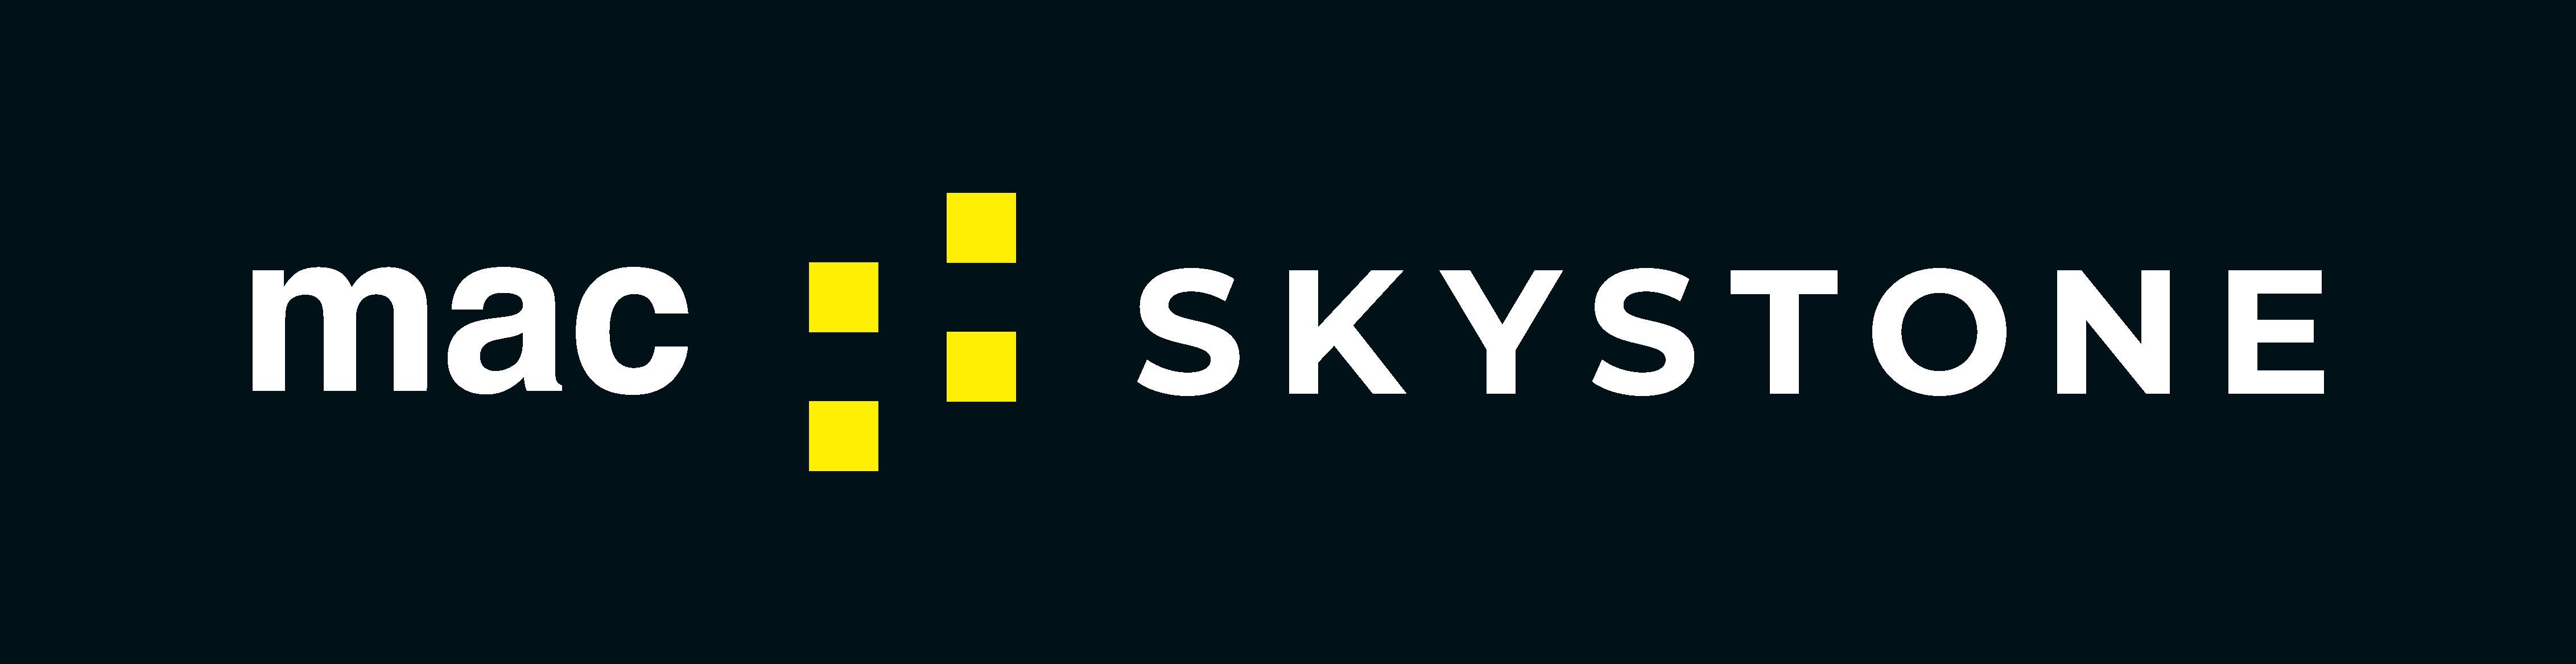 mac Skystone